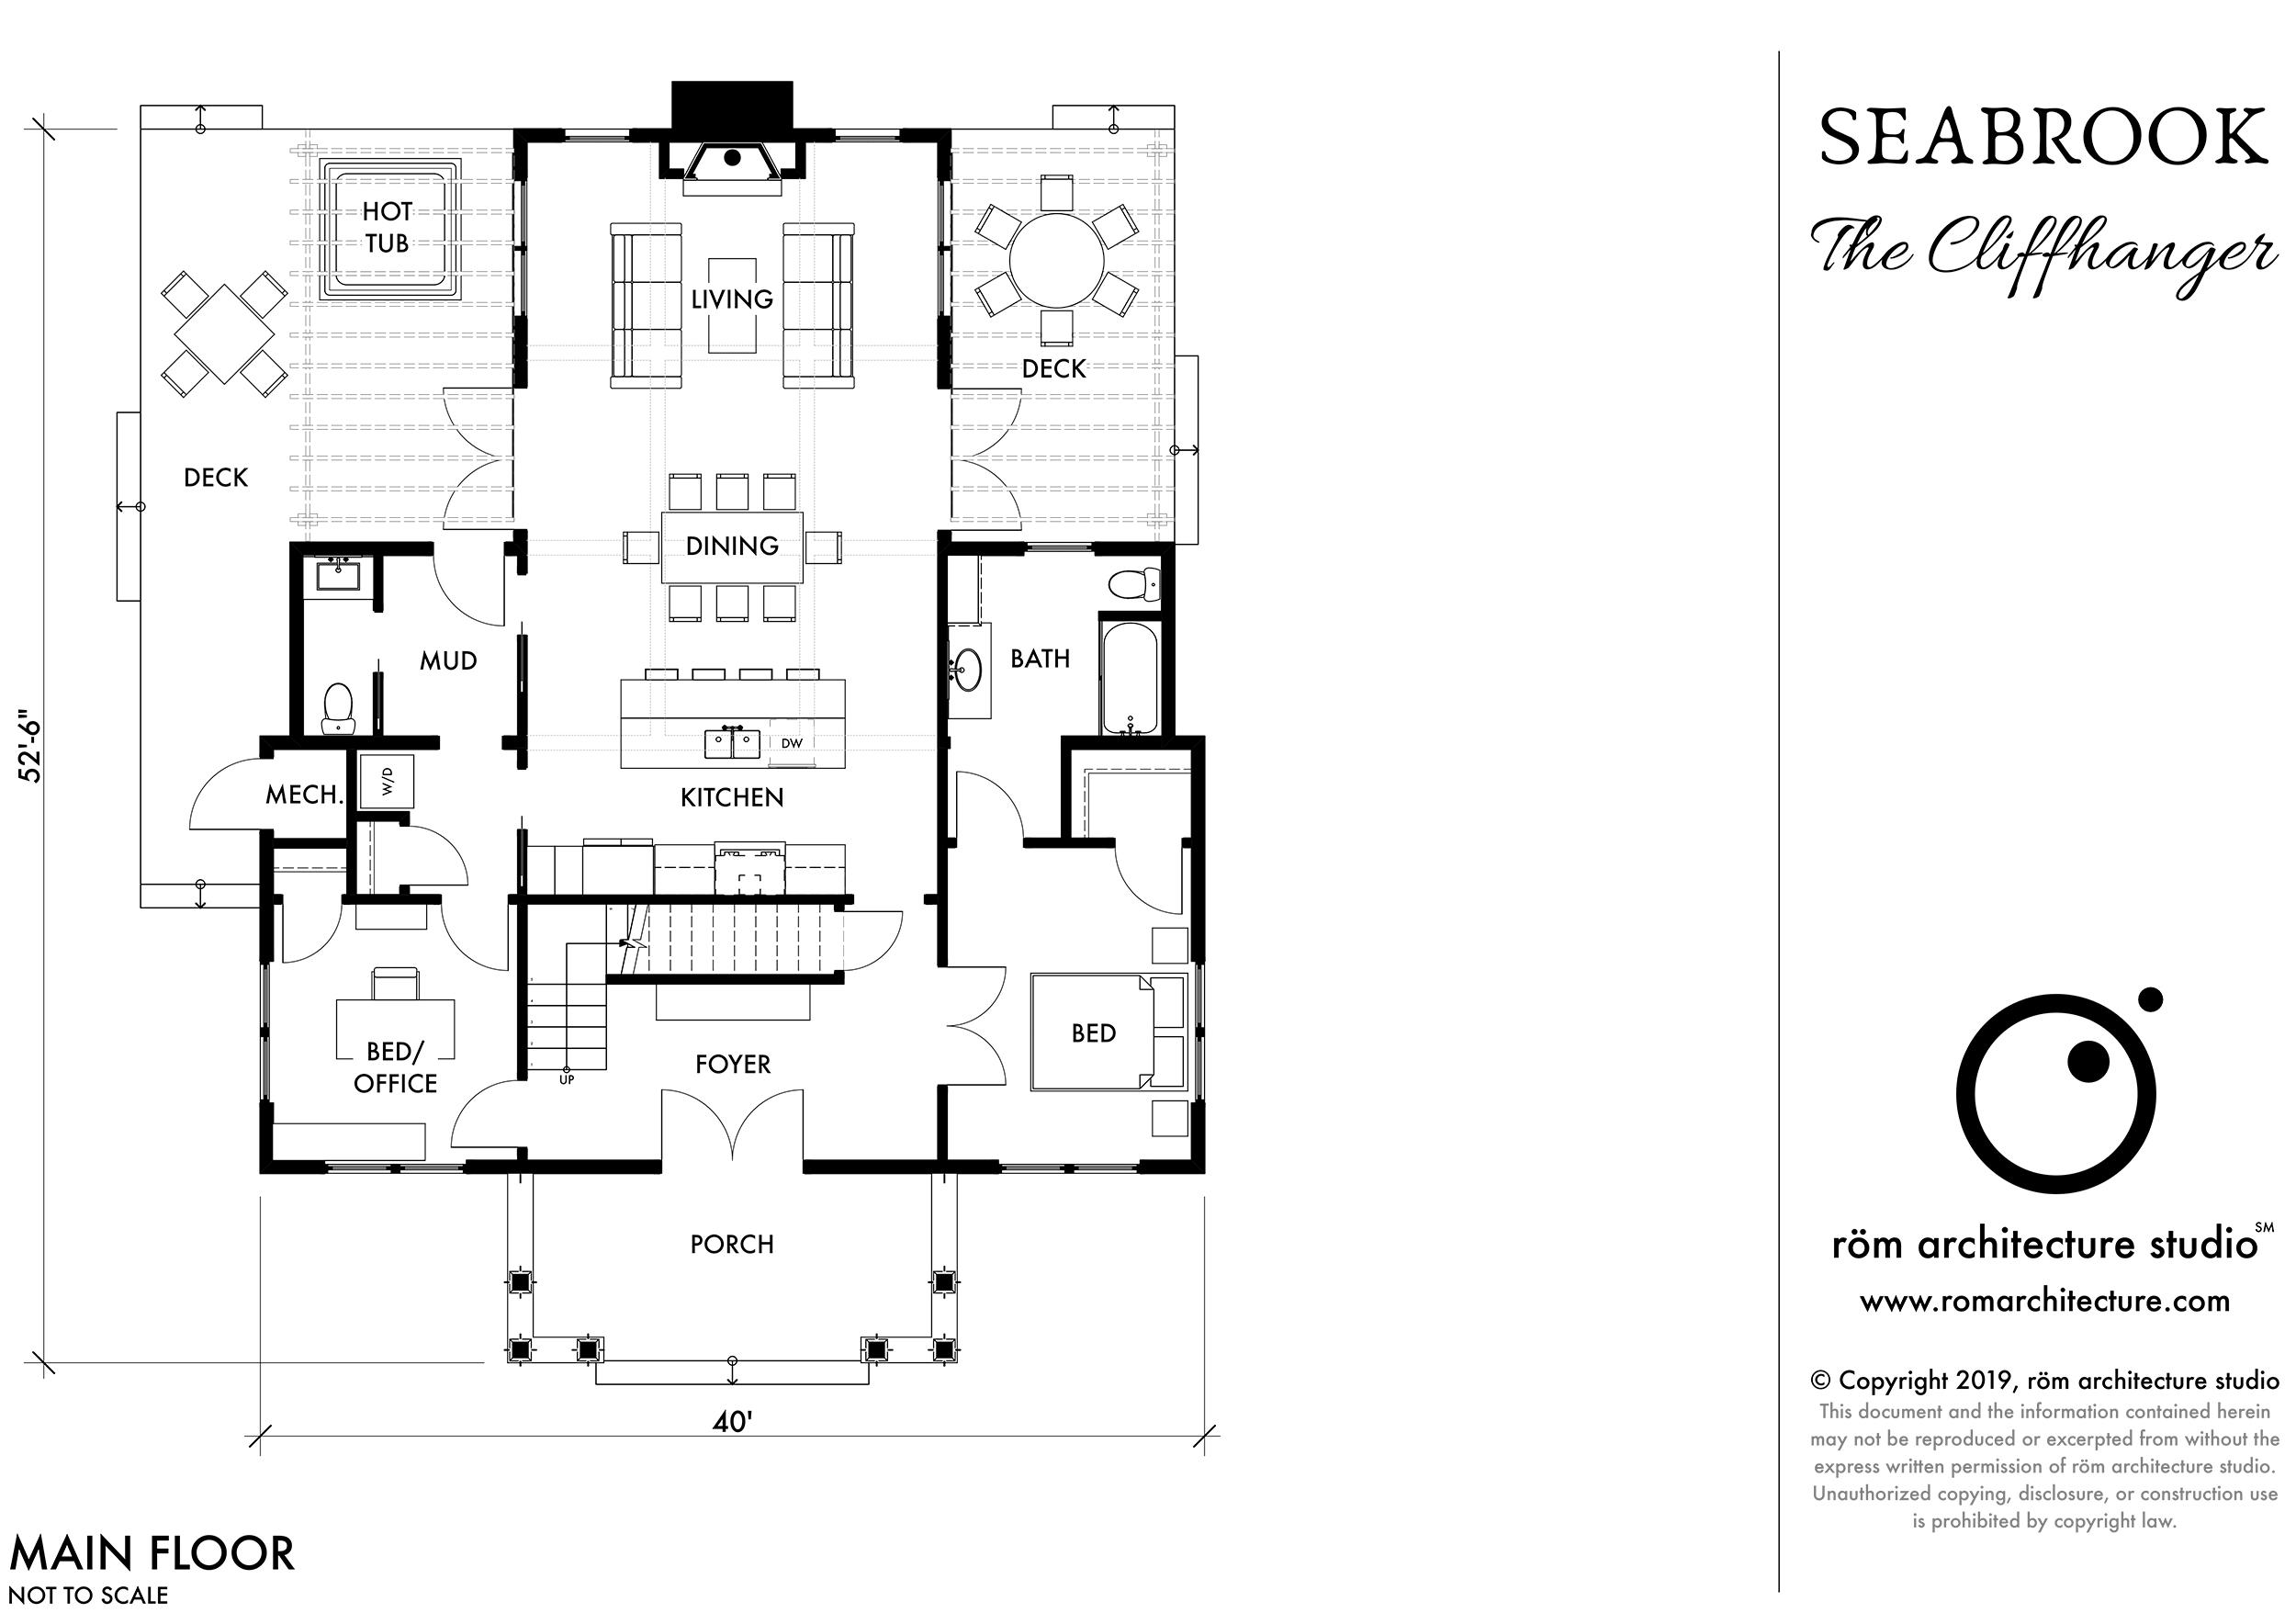 Seabrook-traditional-cottage-design-floor-plan-1.jpg